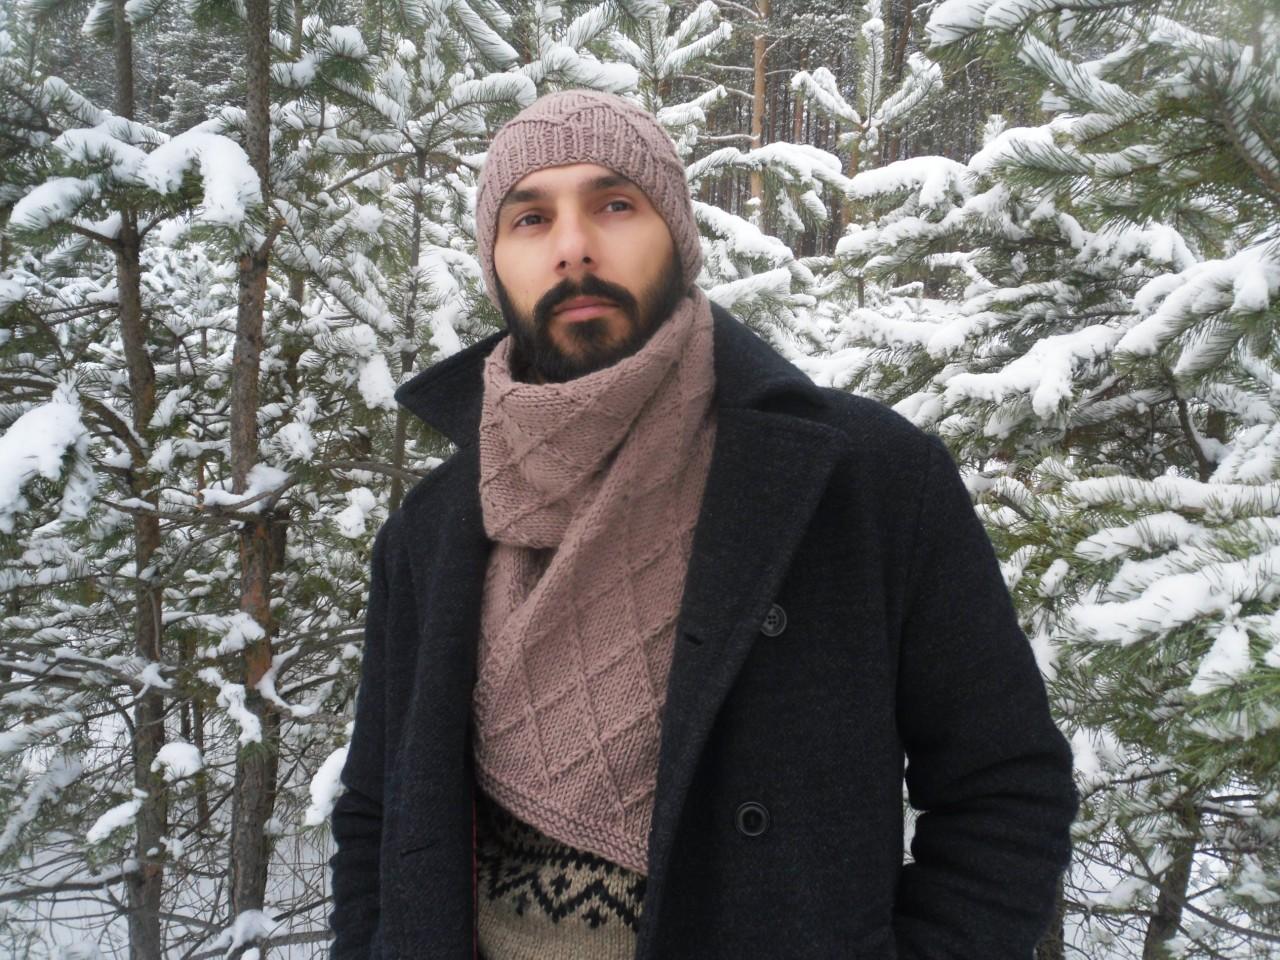 Шапка и шарф с узором из ромбов